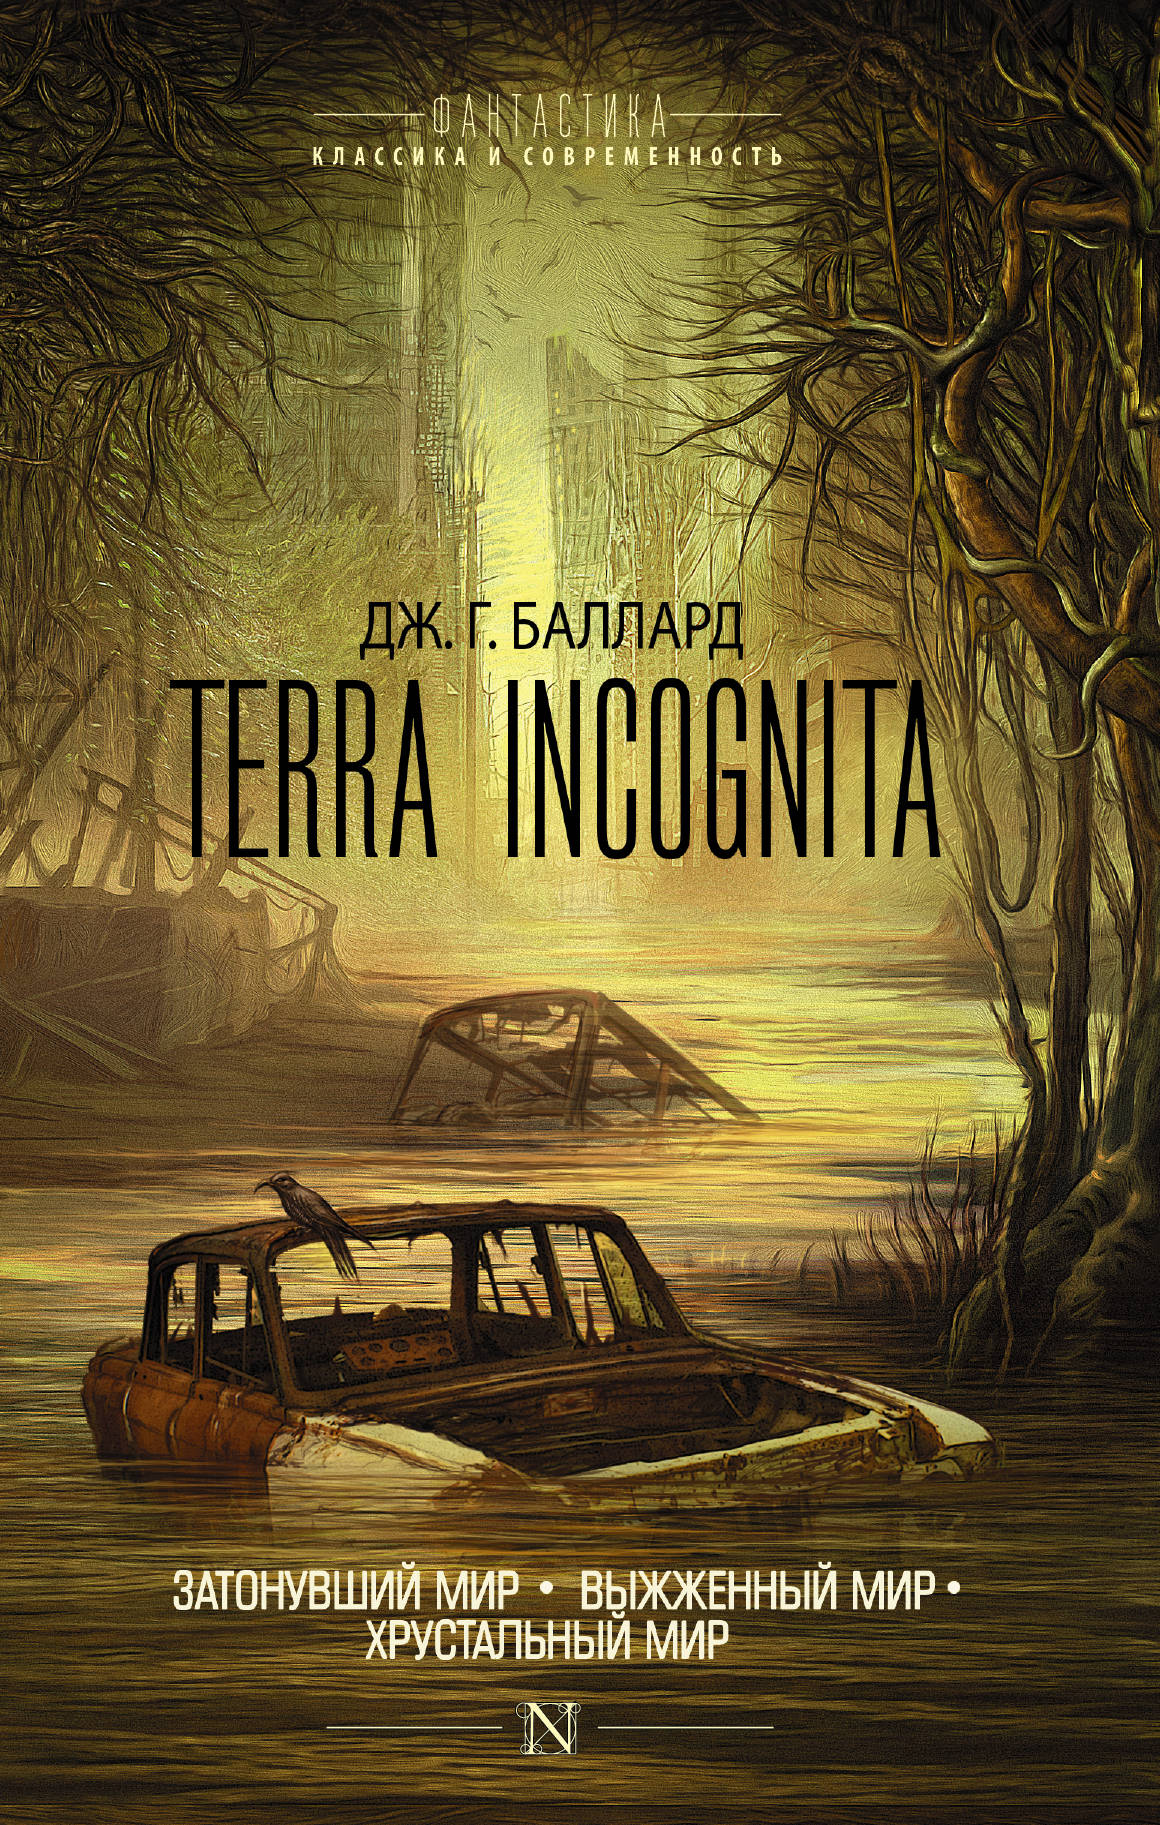 Джеймс Баллард Terra Incognita zona incognita